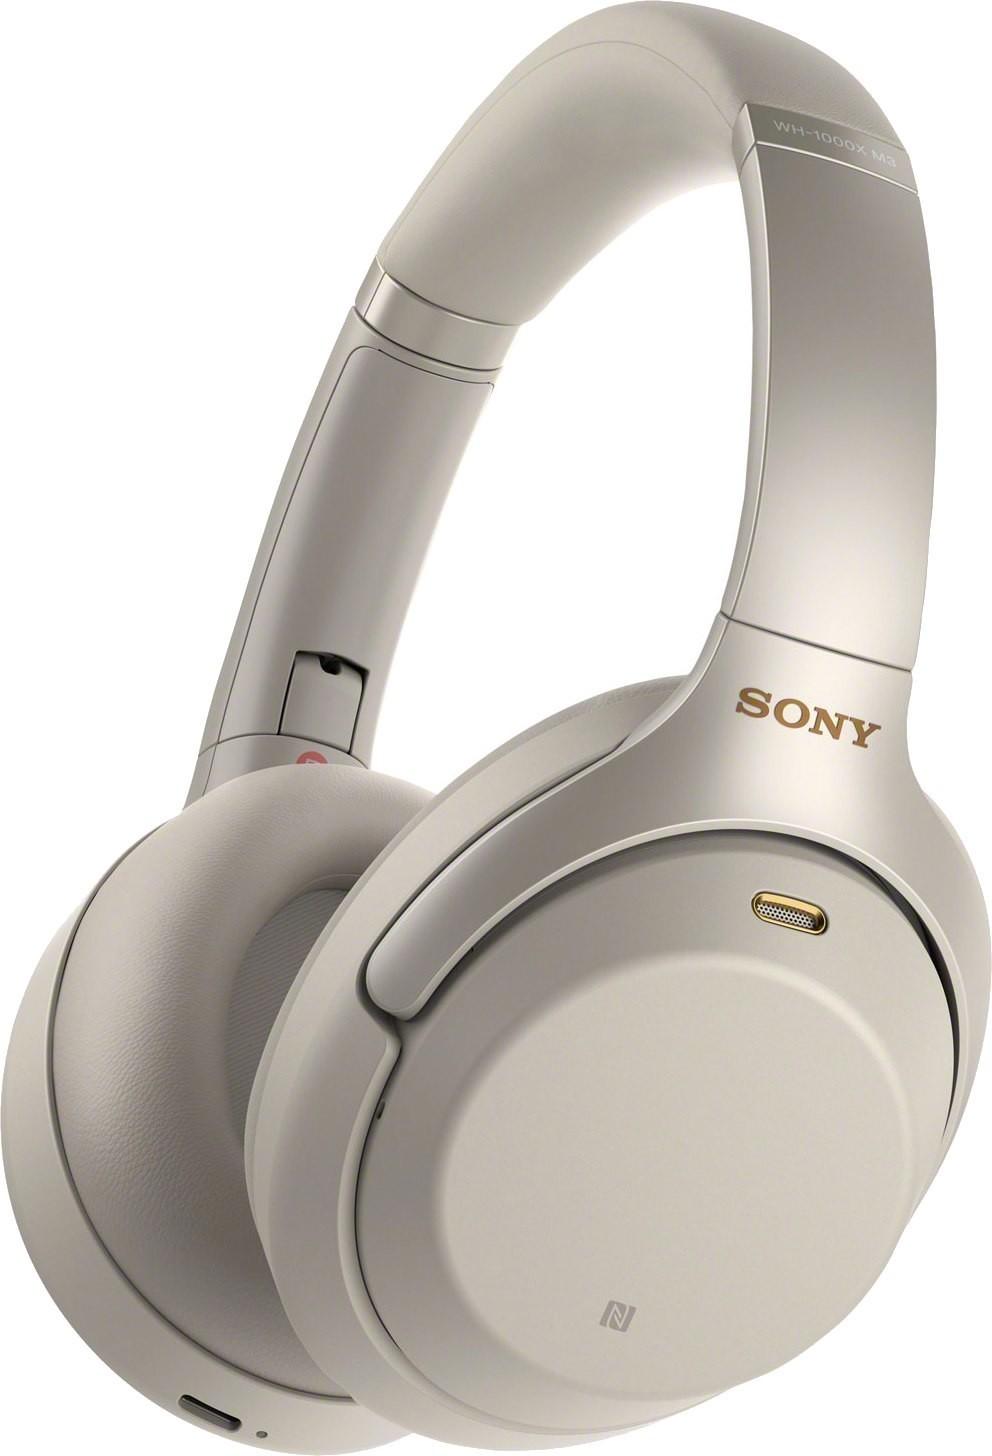 Sony WH-1000XM3 Беспроводные наушники Sony WH-1000XM3 Silver (Серебристый) 11.jpeg